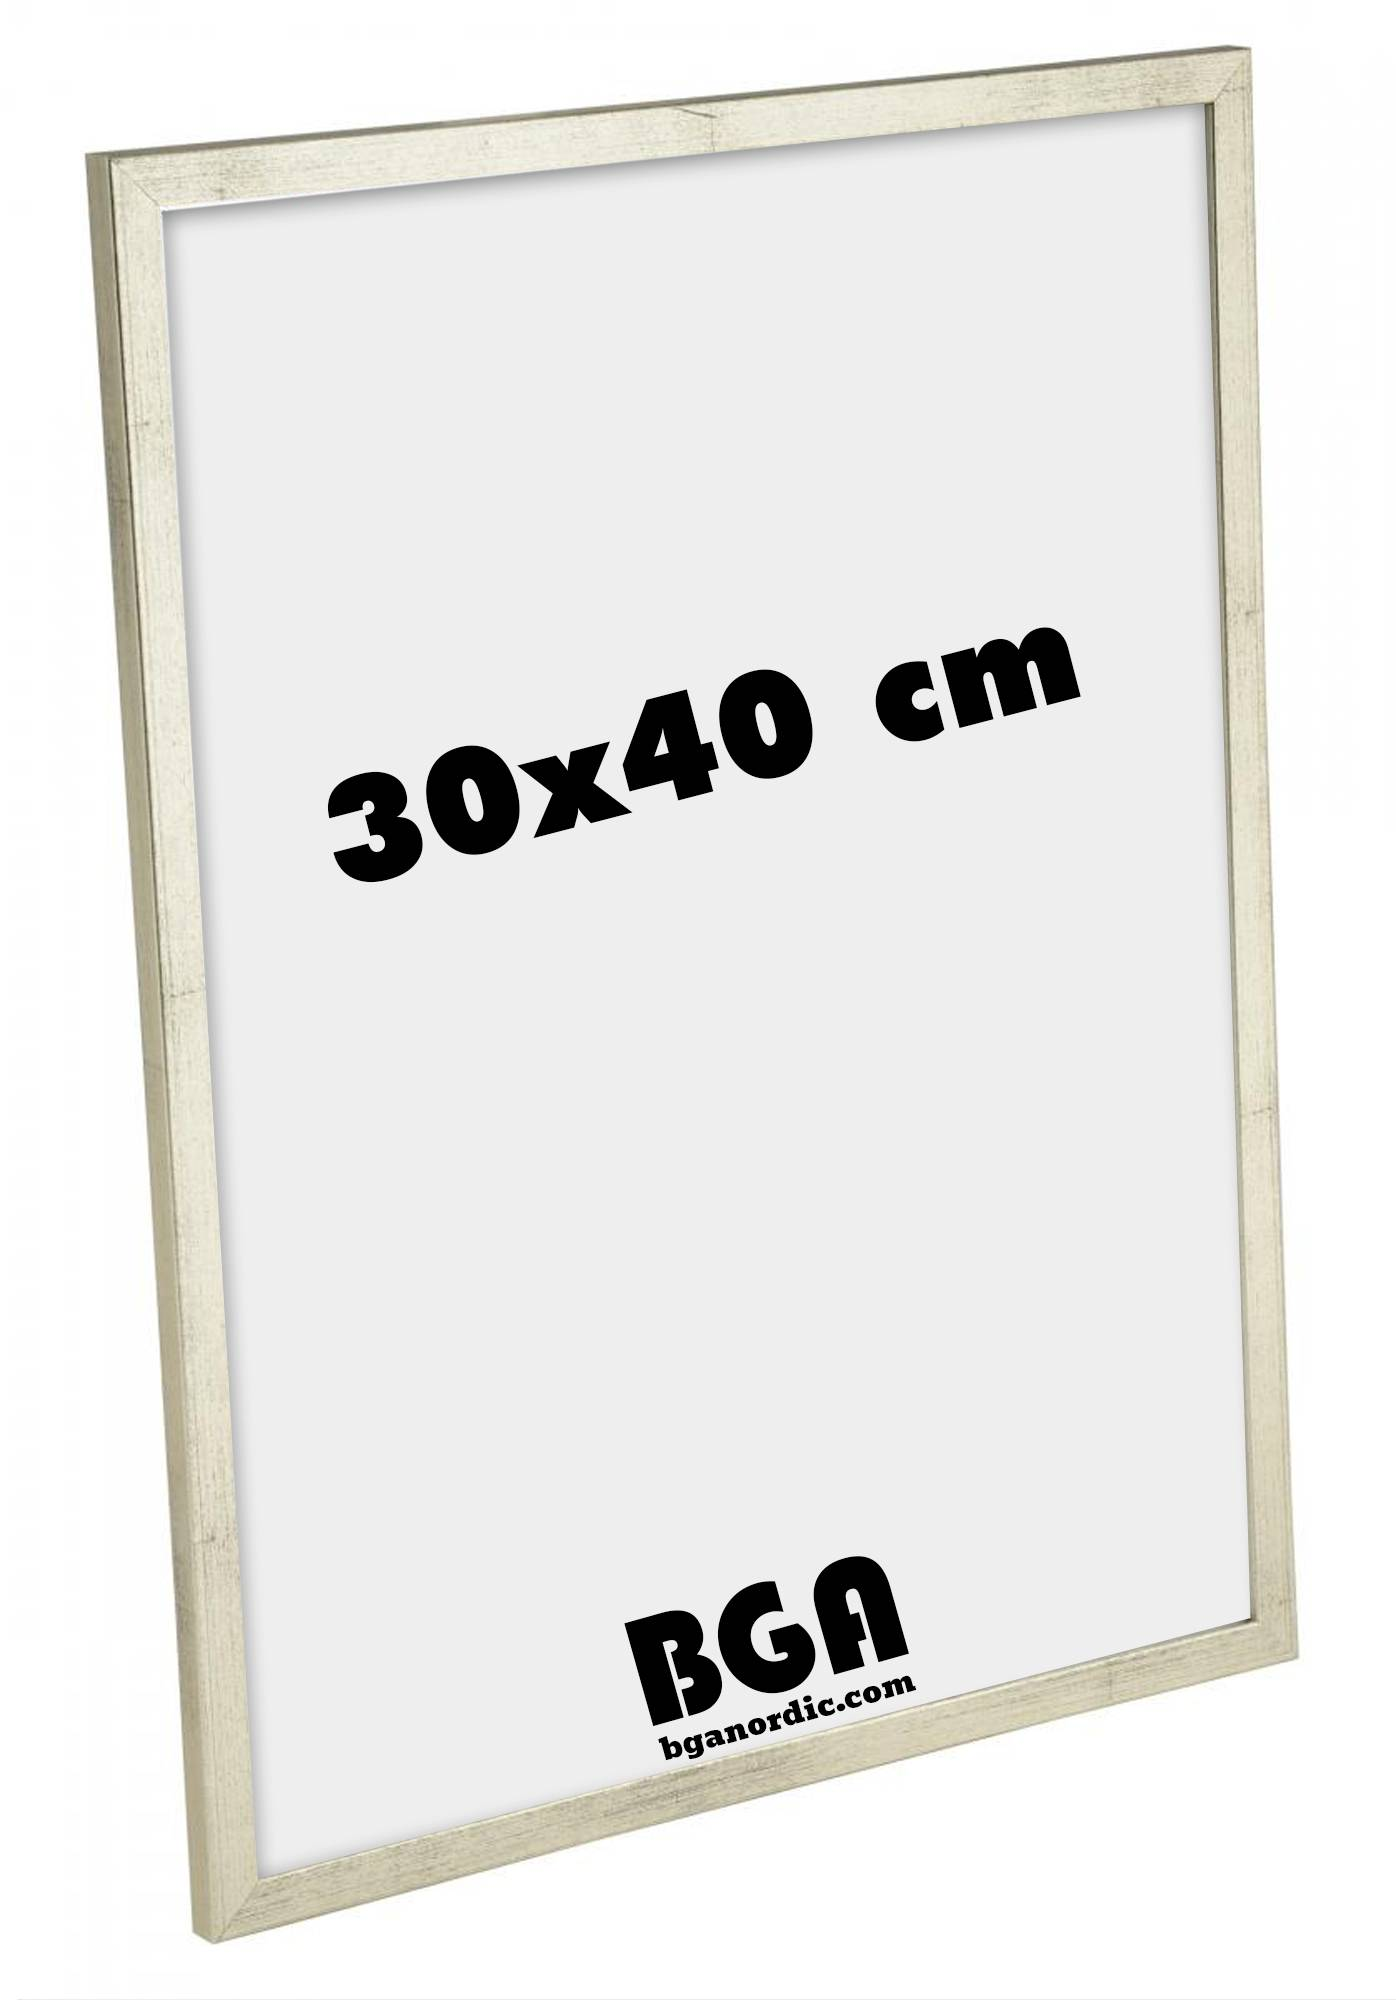 Estancia Galant Pleksilasi Hopeanvärinen 30x40 cm